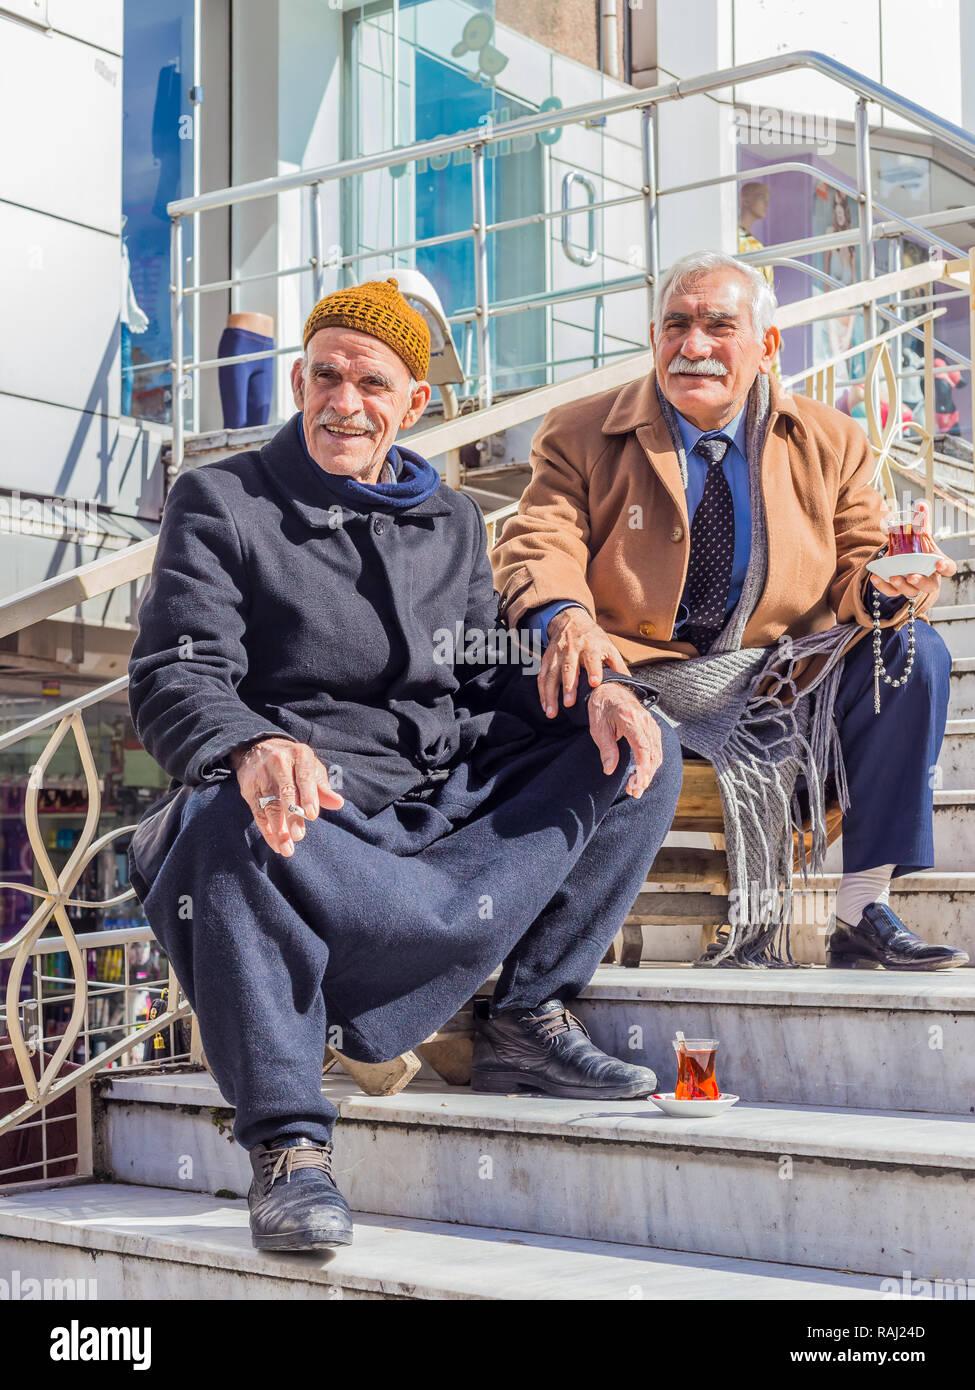 Istanbul, Turkey, February 24, 2015: Two elderly Turkish men seated on some steps, drinking Turkish tea. Stock Photo